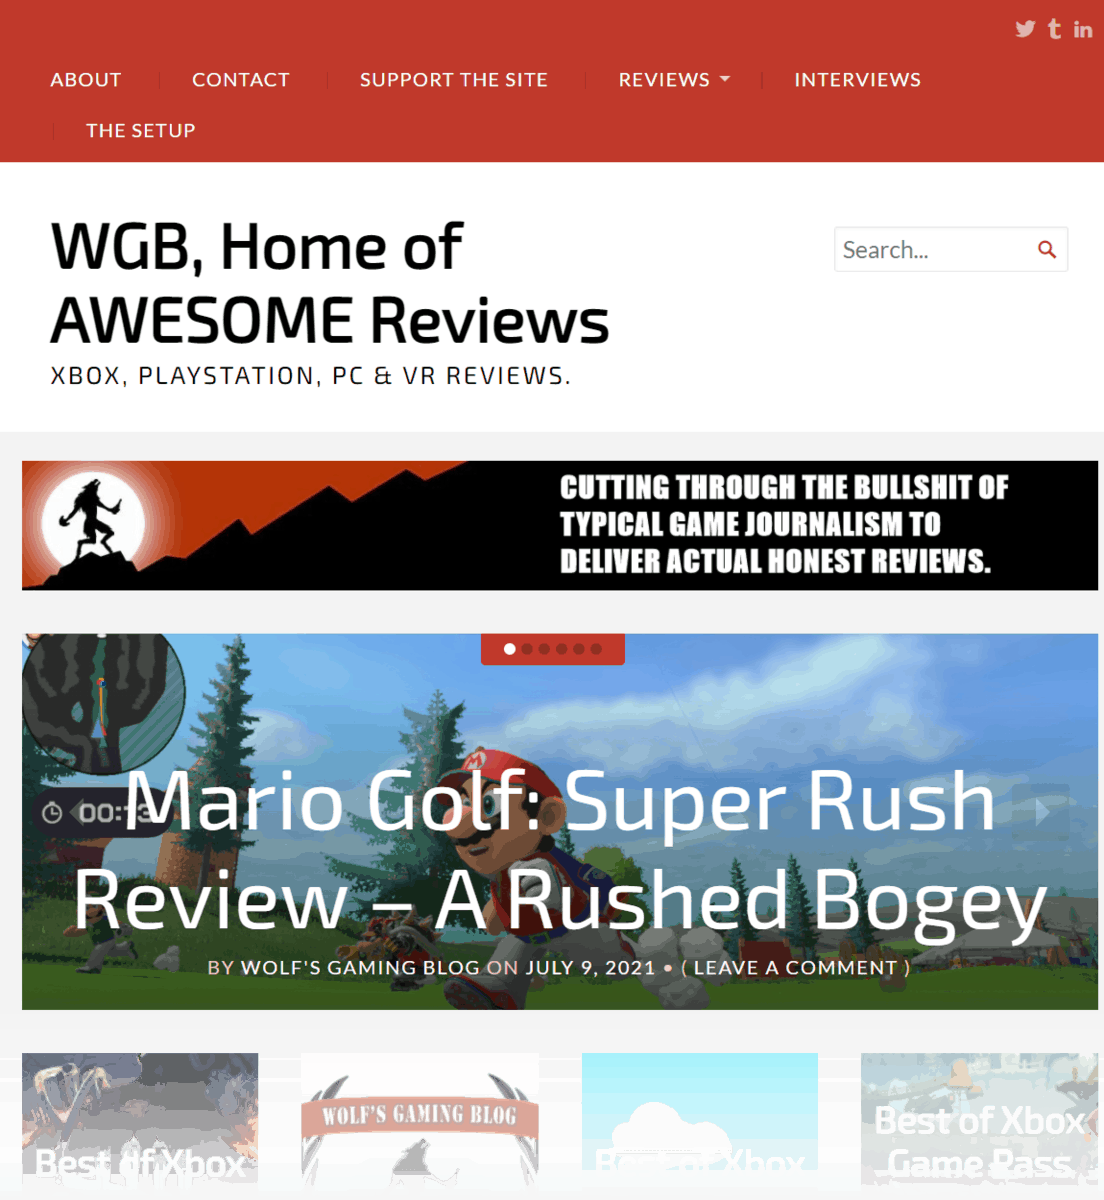 Wolf's Gaming Blog